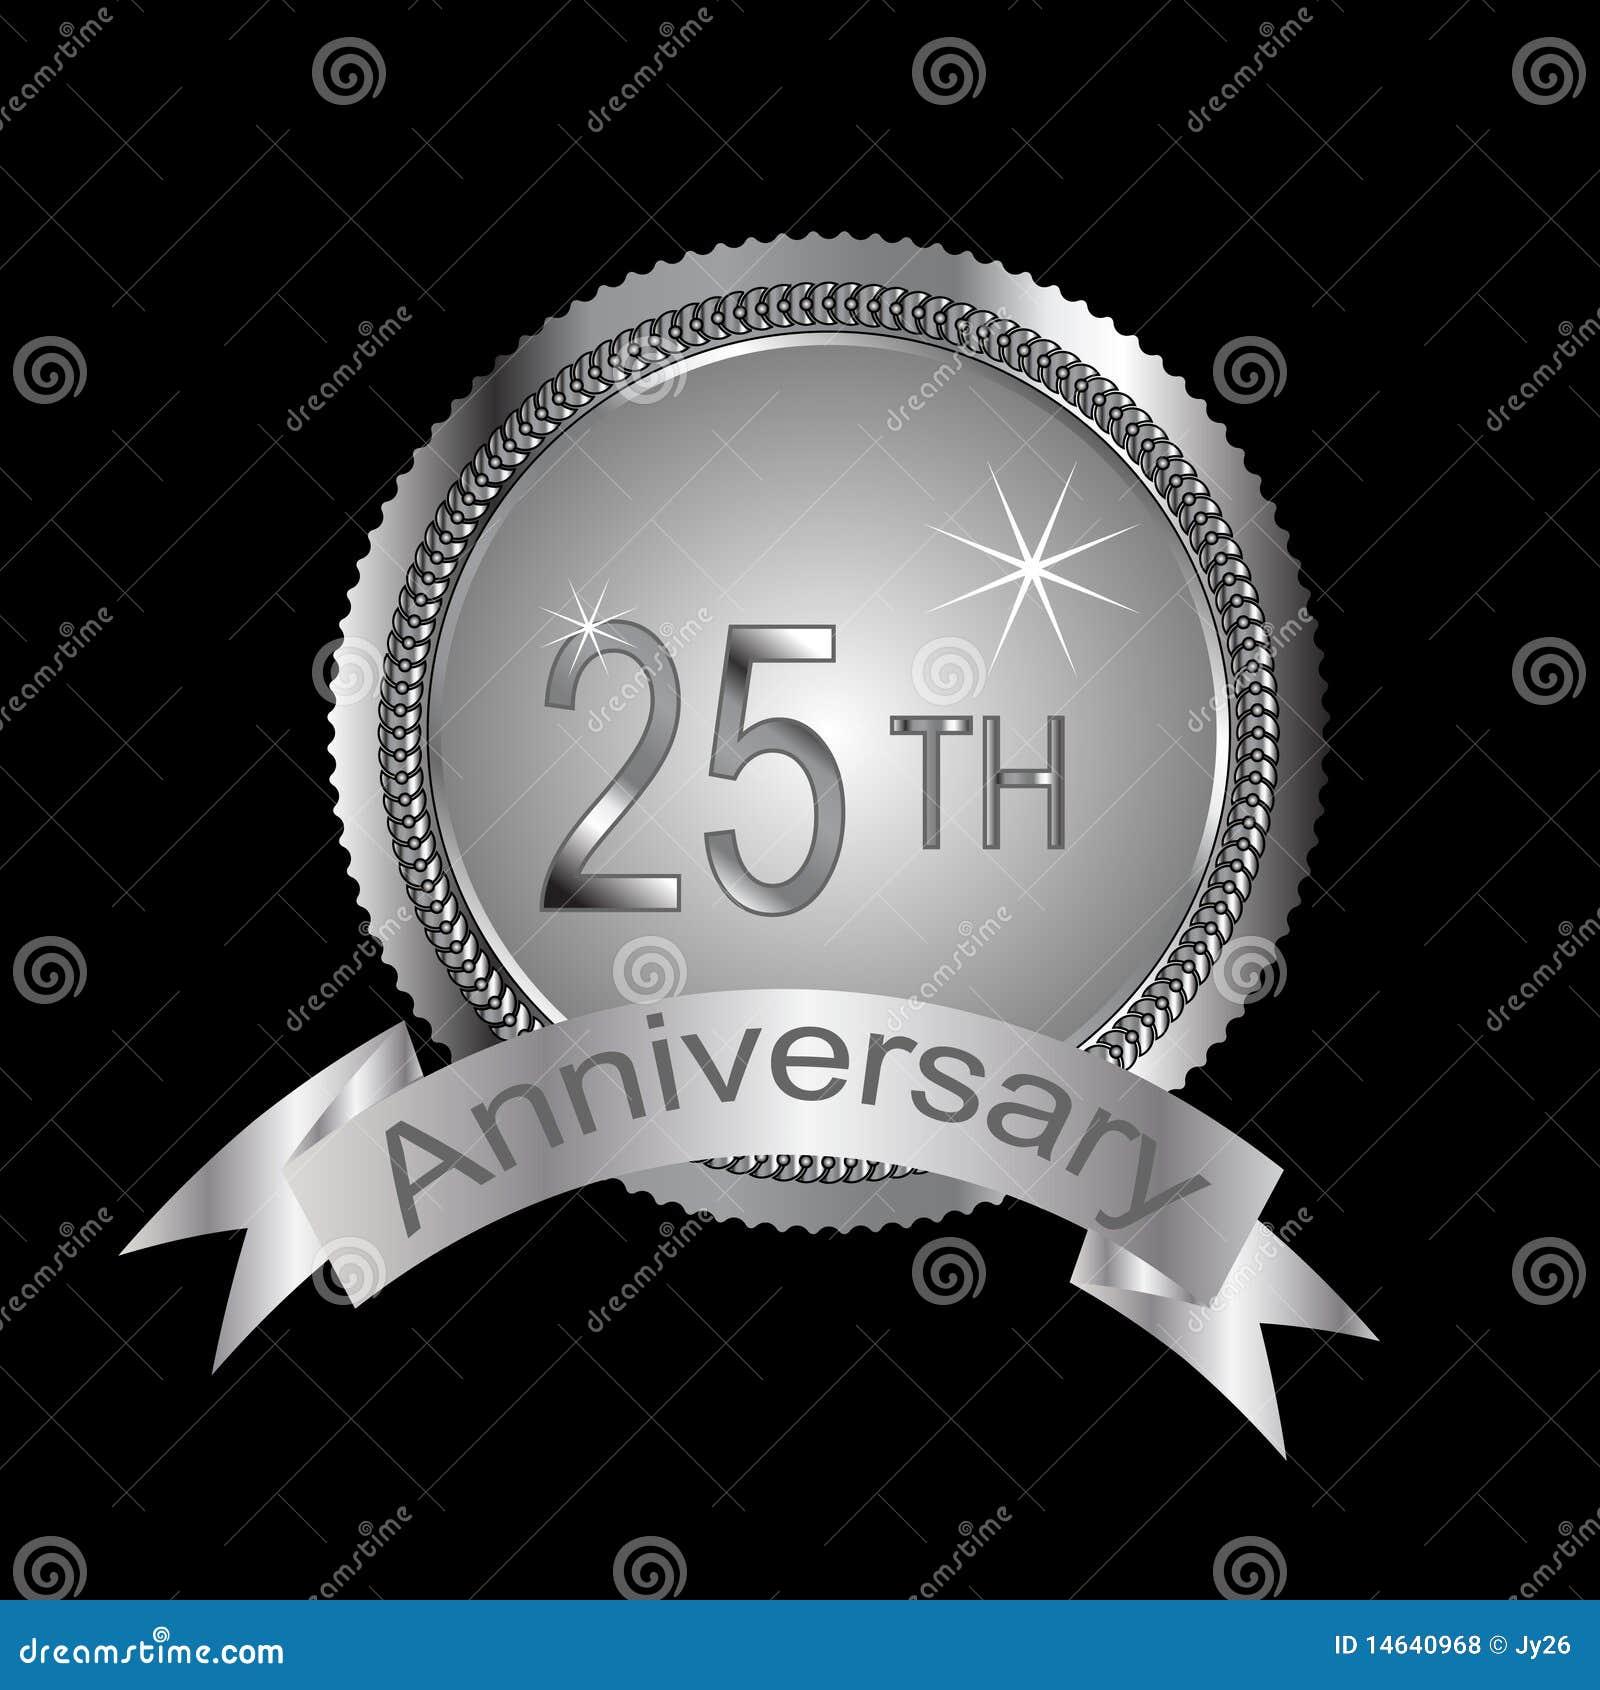 free silver wedding anniversary clipart - photo #20